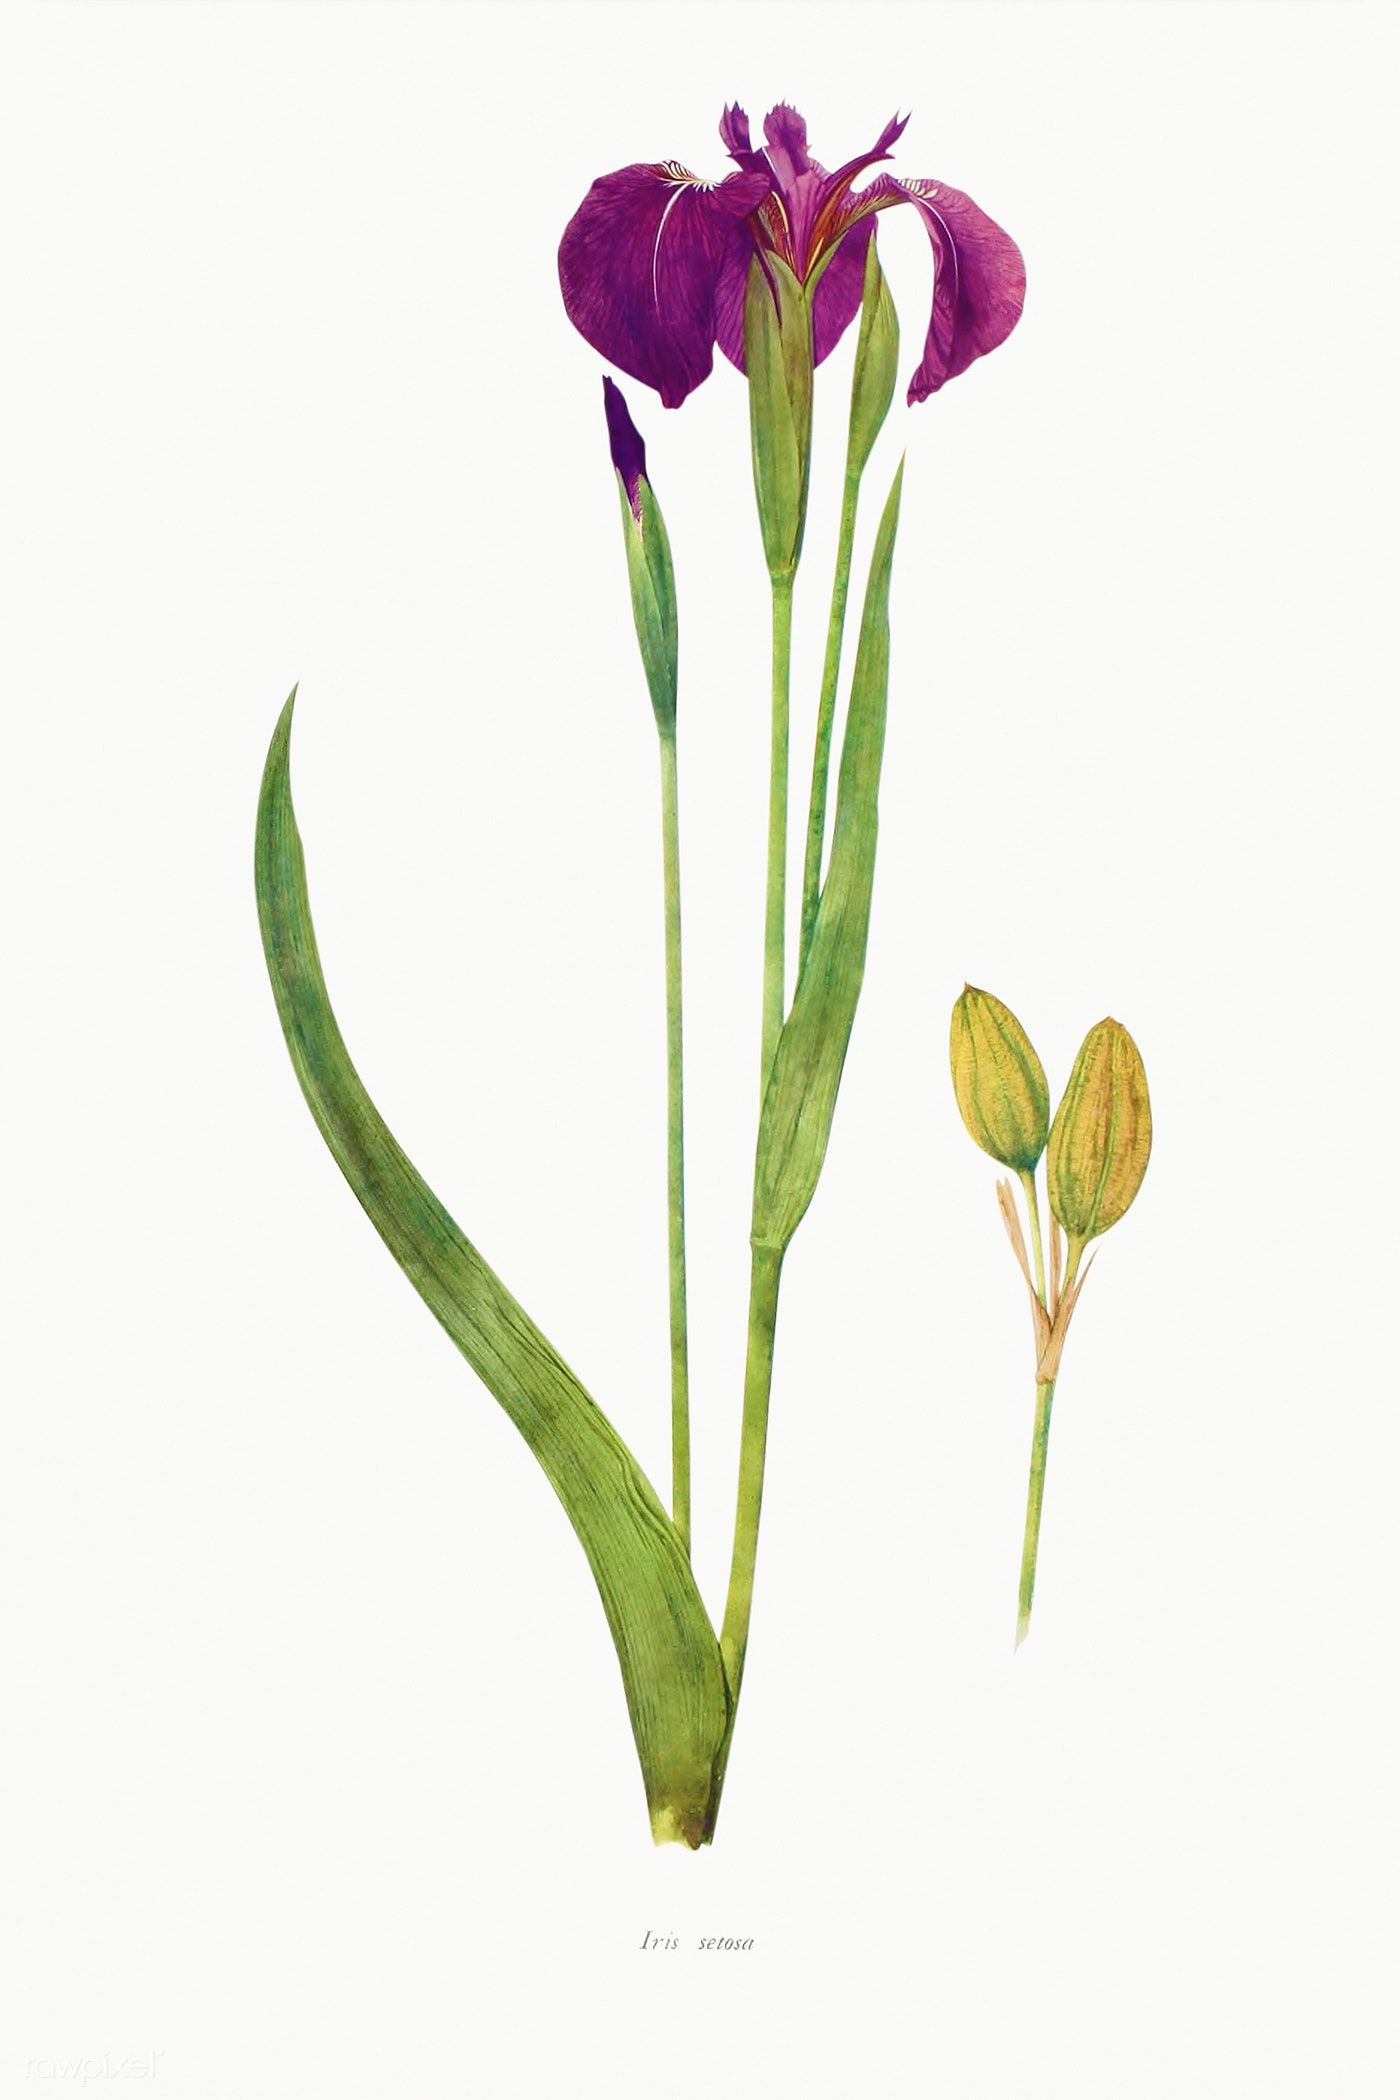 Download Premium Illustration Of Vintage Iris Flower Illustration Template In 2020 Flower Illustration Iris Flowers Seed Illustration